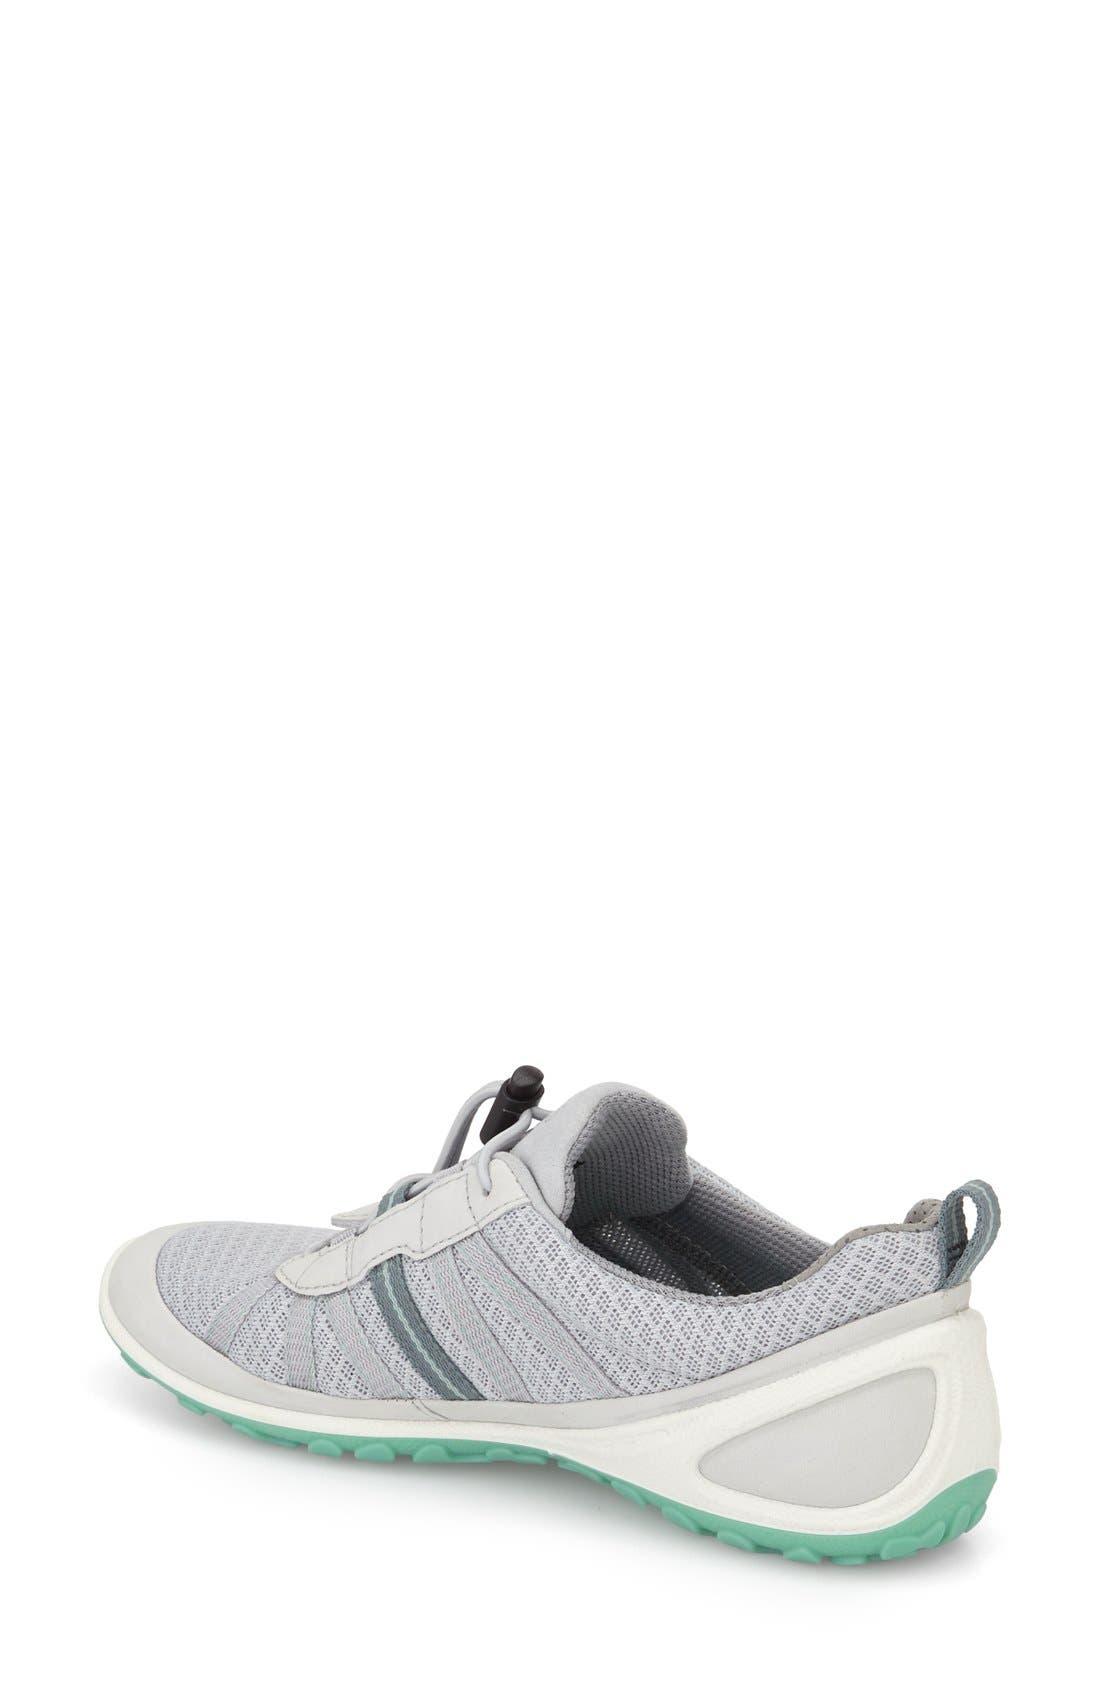 Alternate Image 2  - ECCO 'Biom Lite' Sneaker (Women)